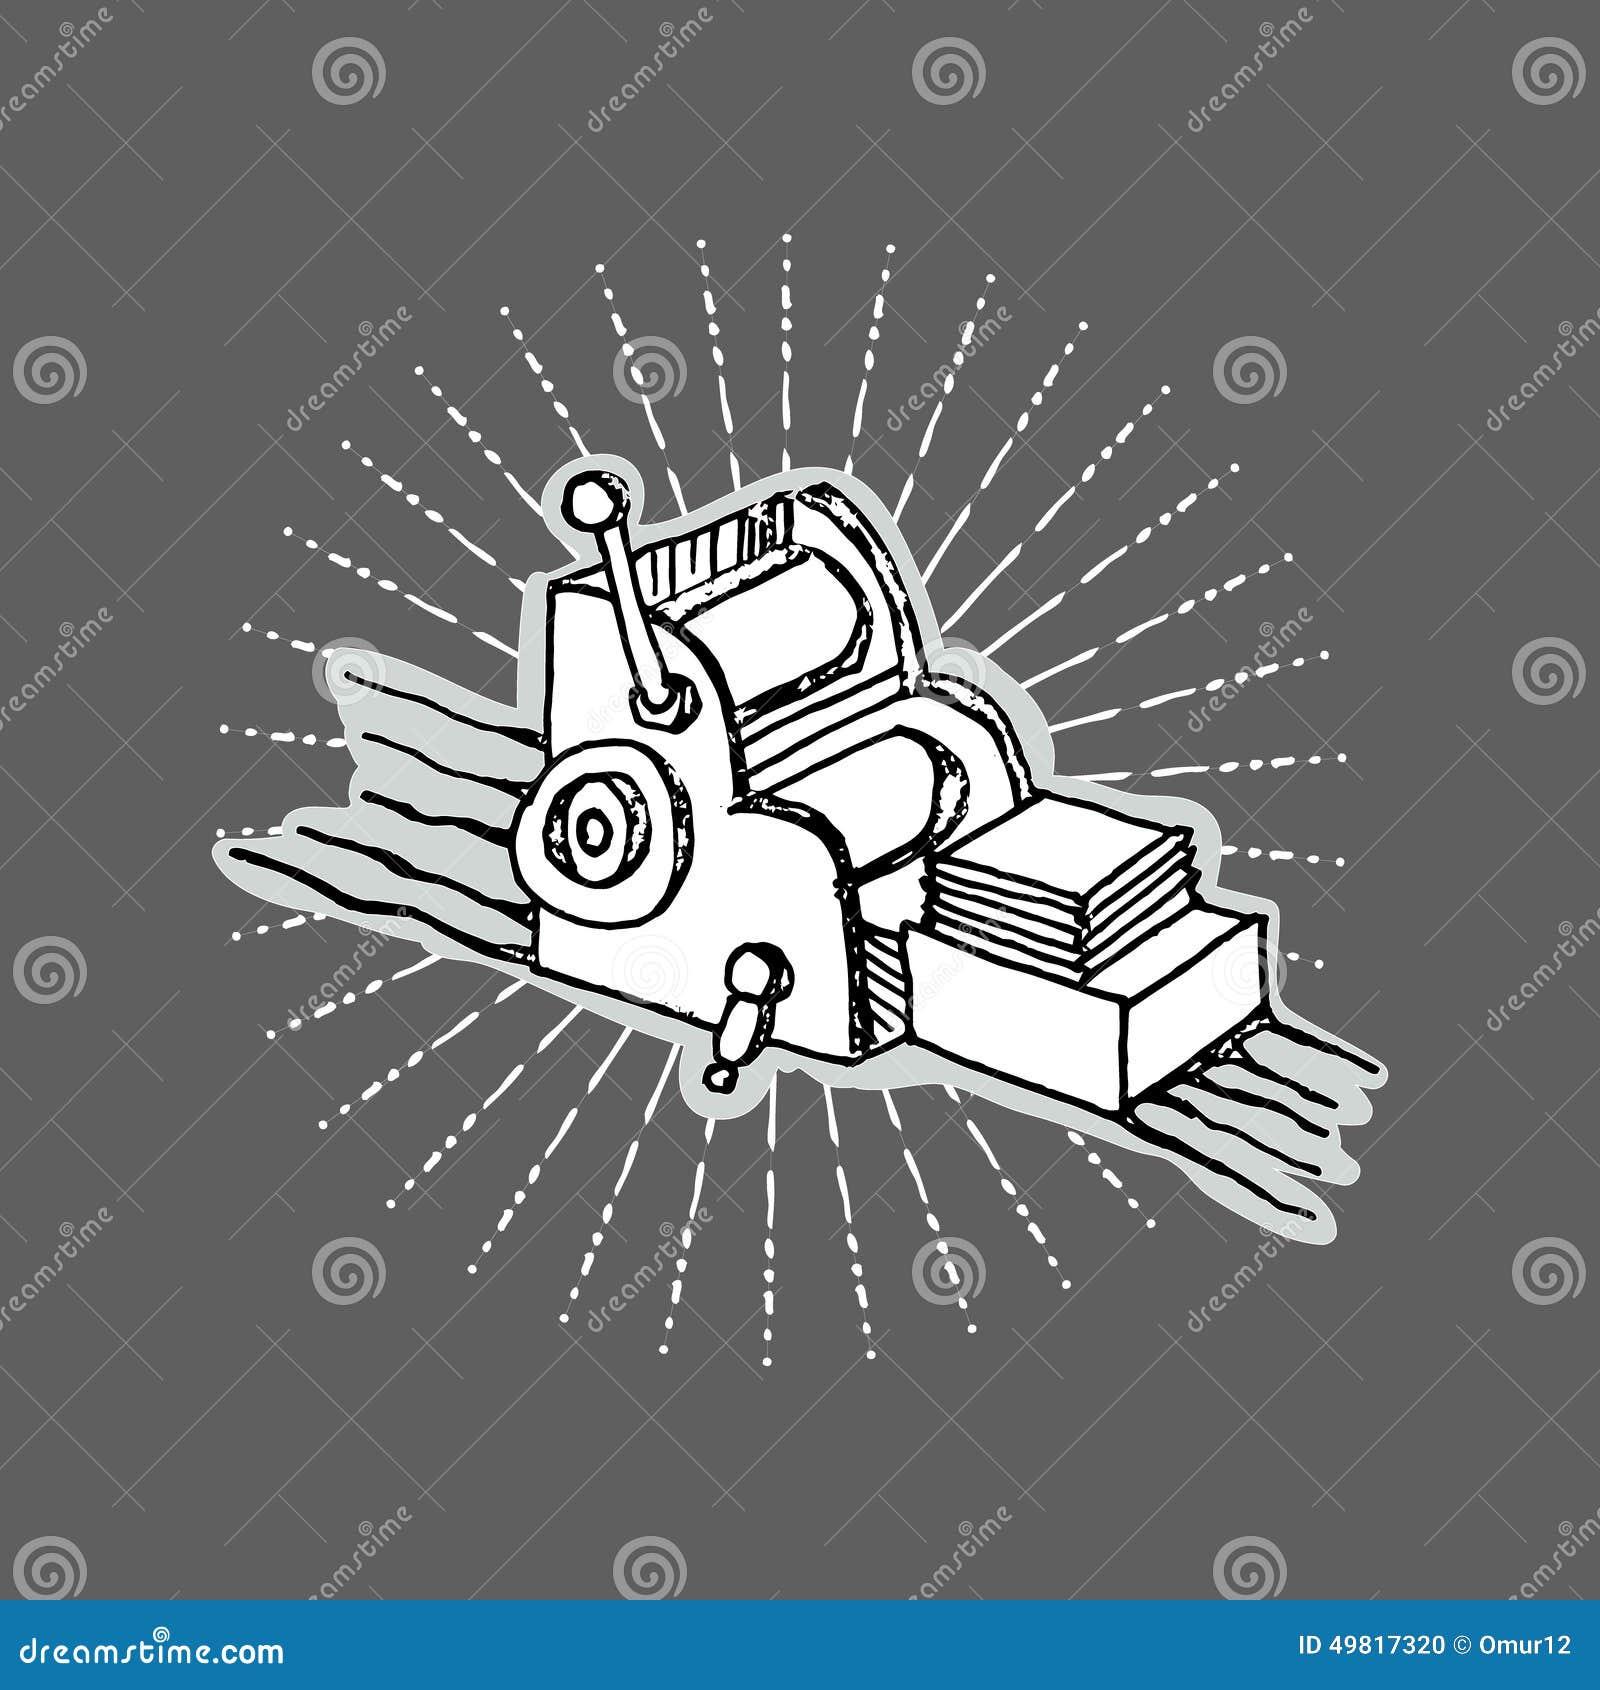 print shop logo desktop printing machine stock vector illustration